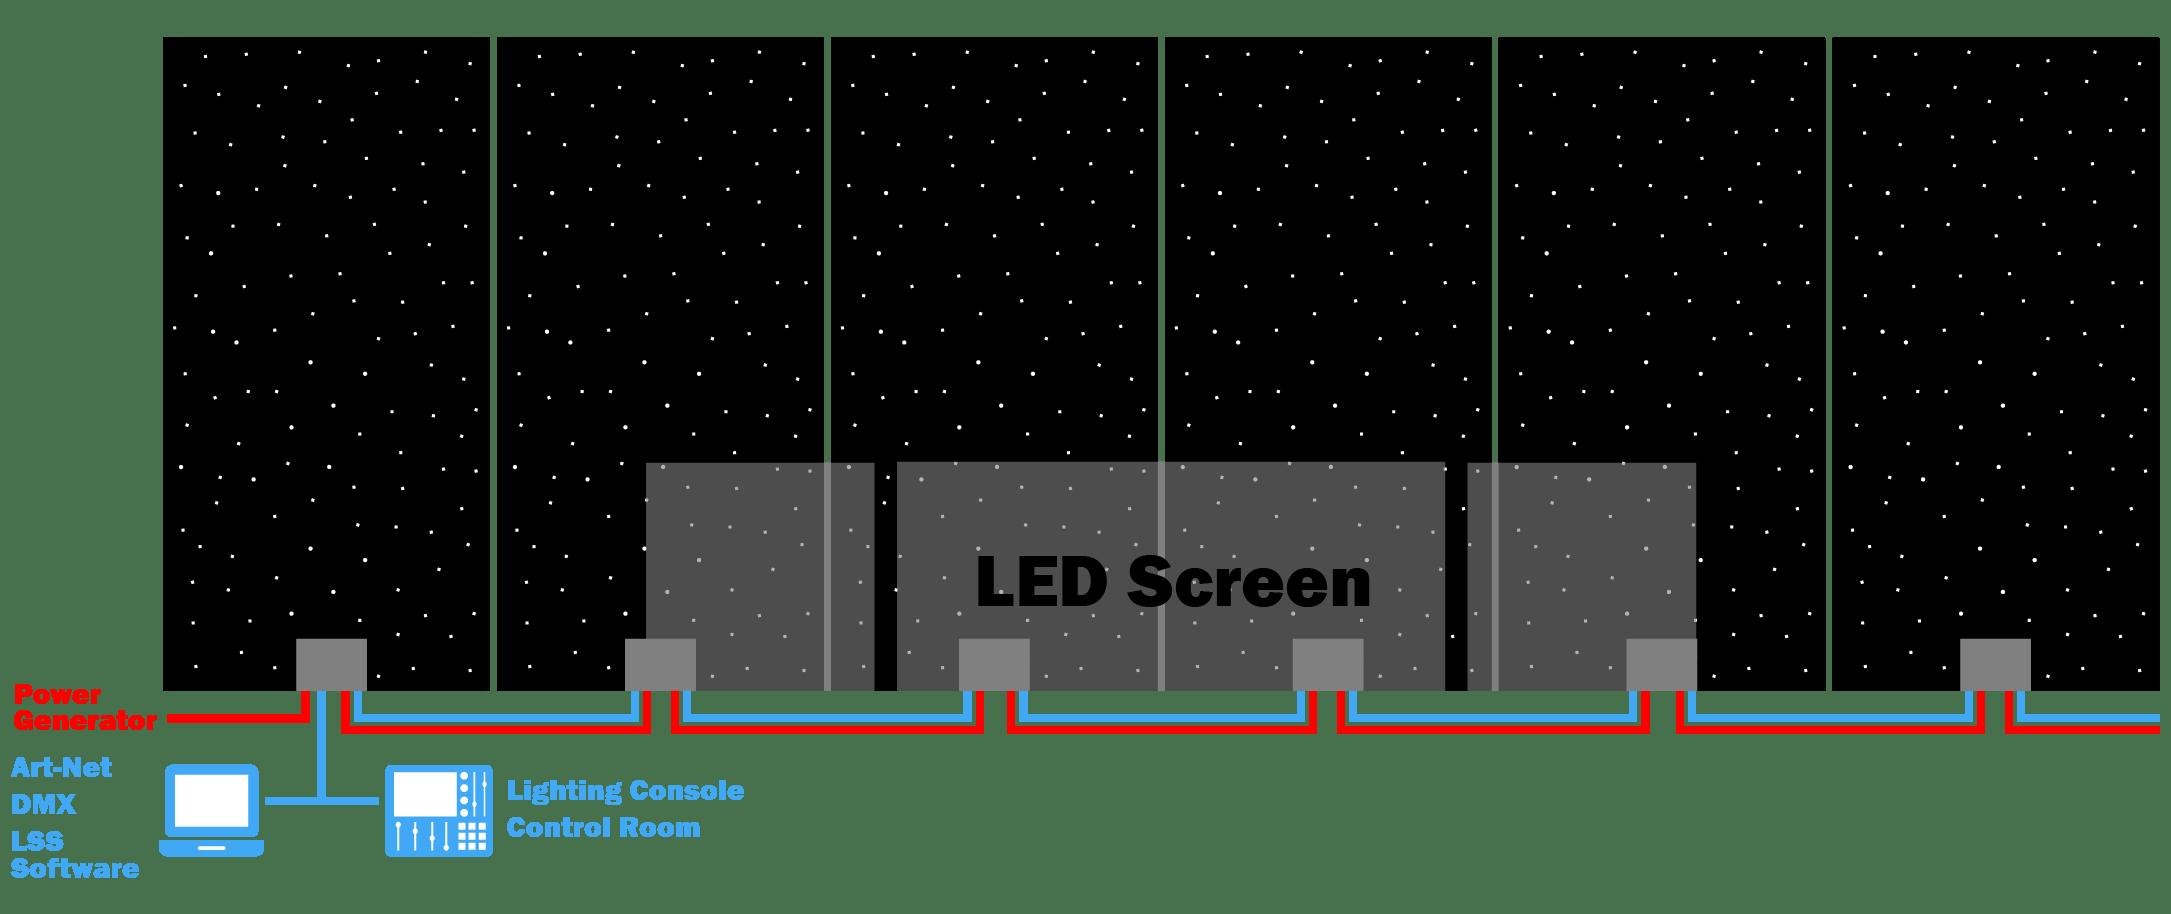 control scheme of led curtains over art-net, dmx, led strip studio